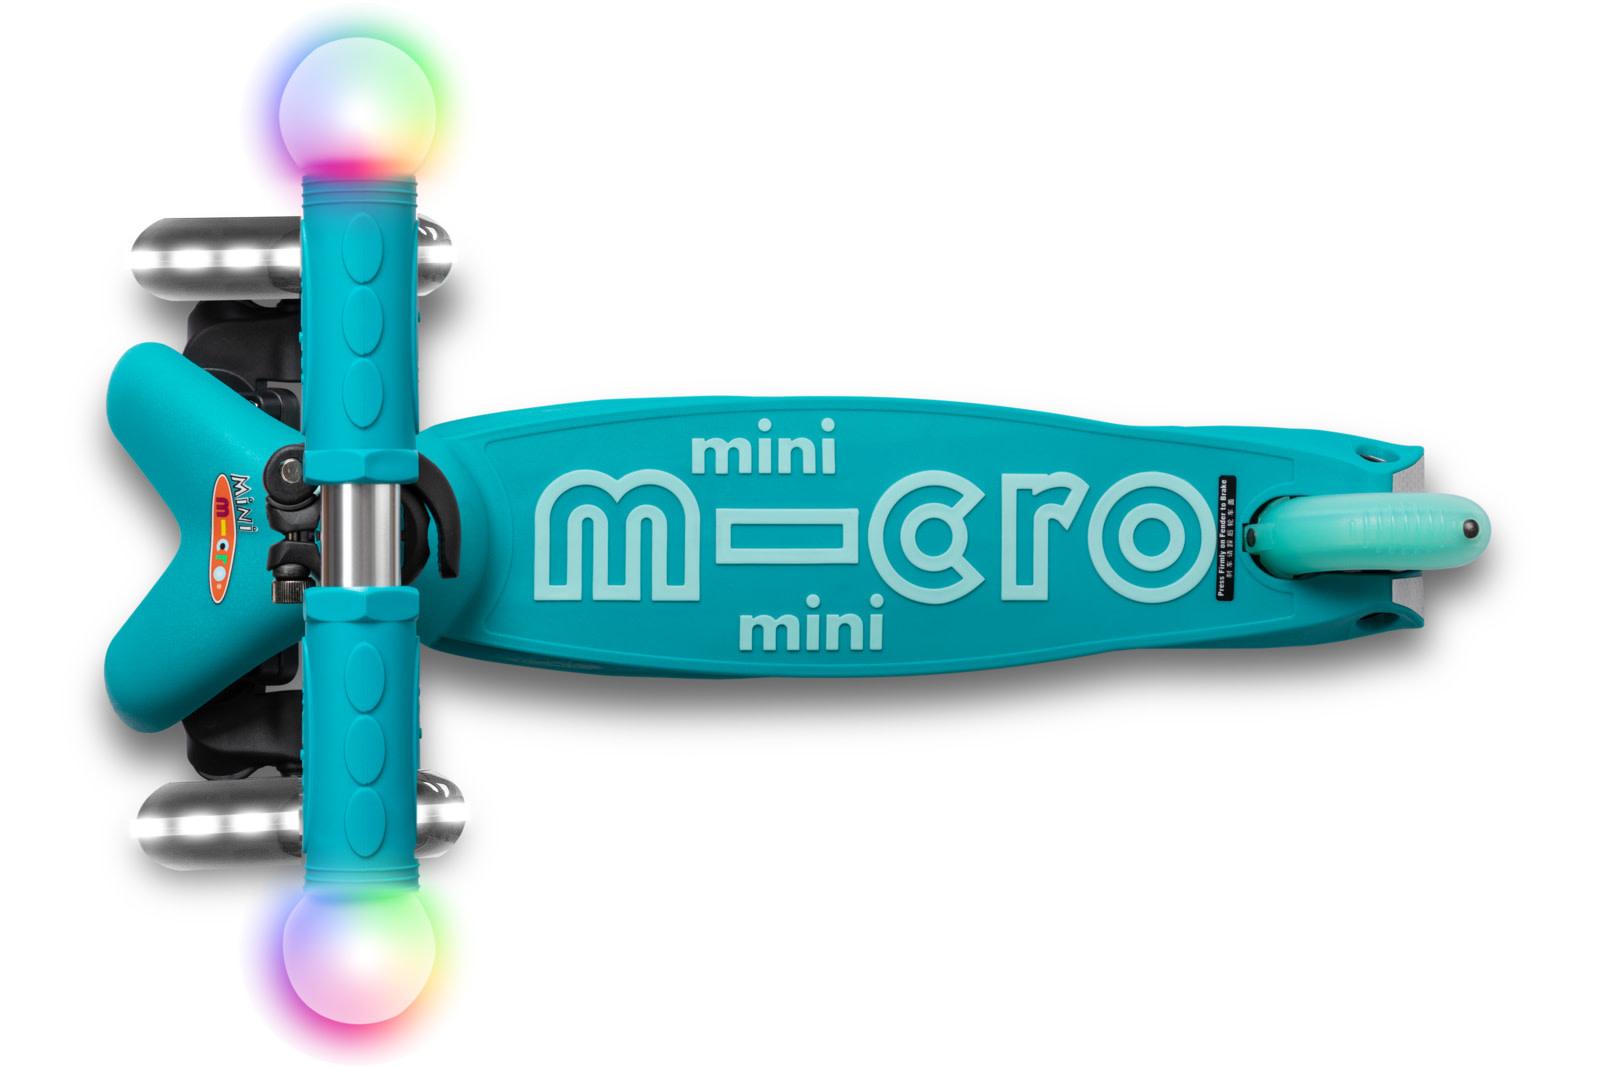 Micro steps Mini micro step magic aqua